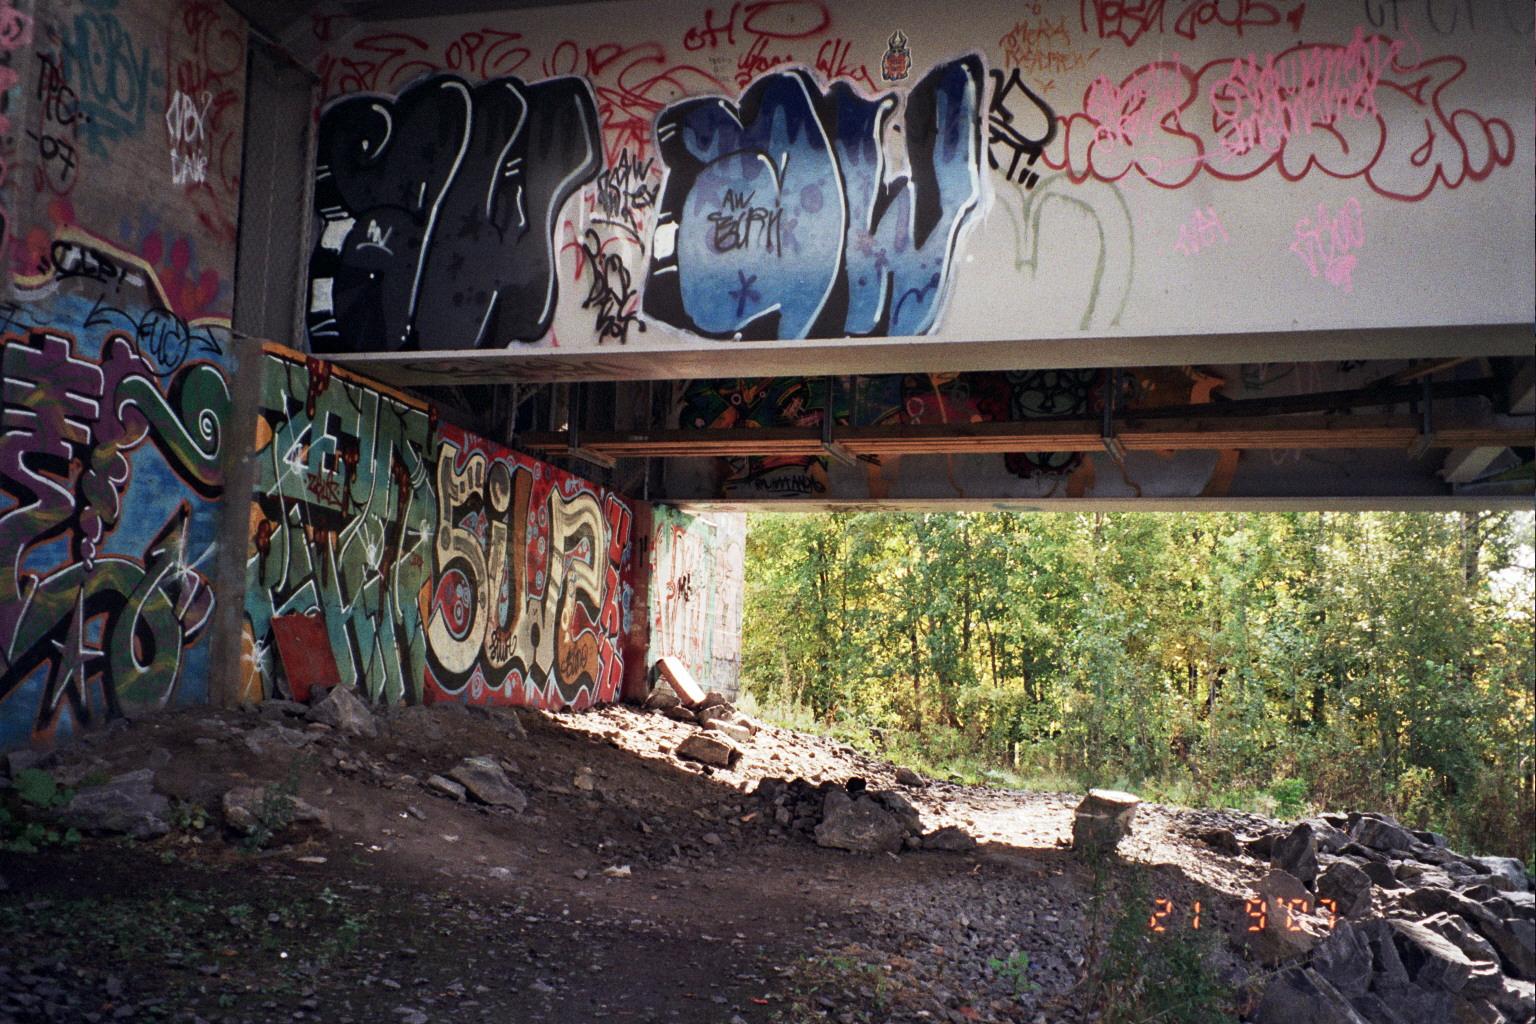 Under the bridge release date